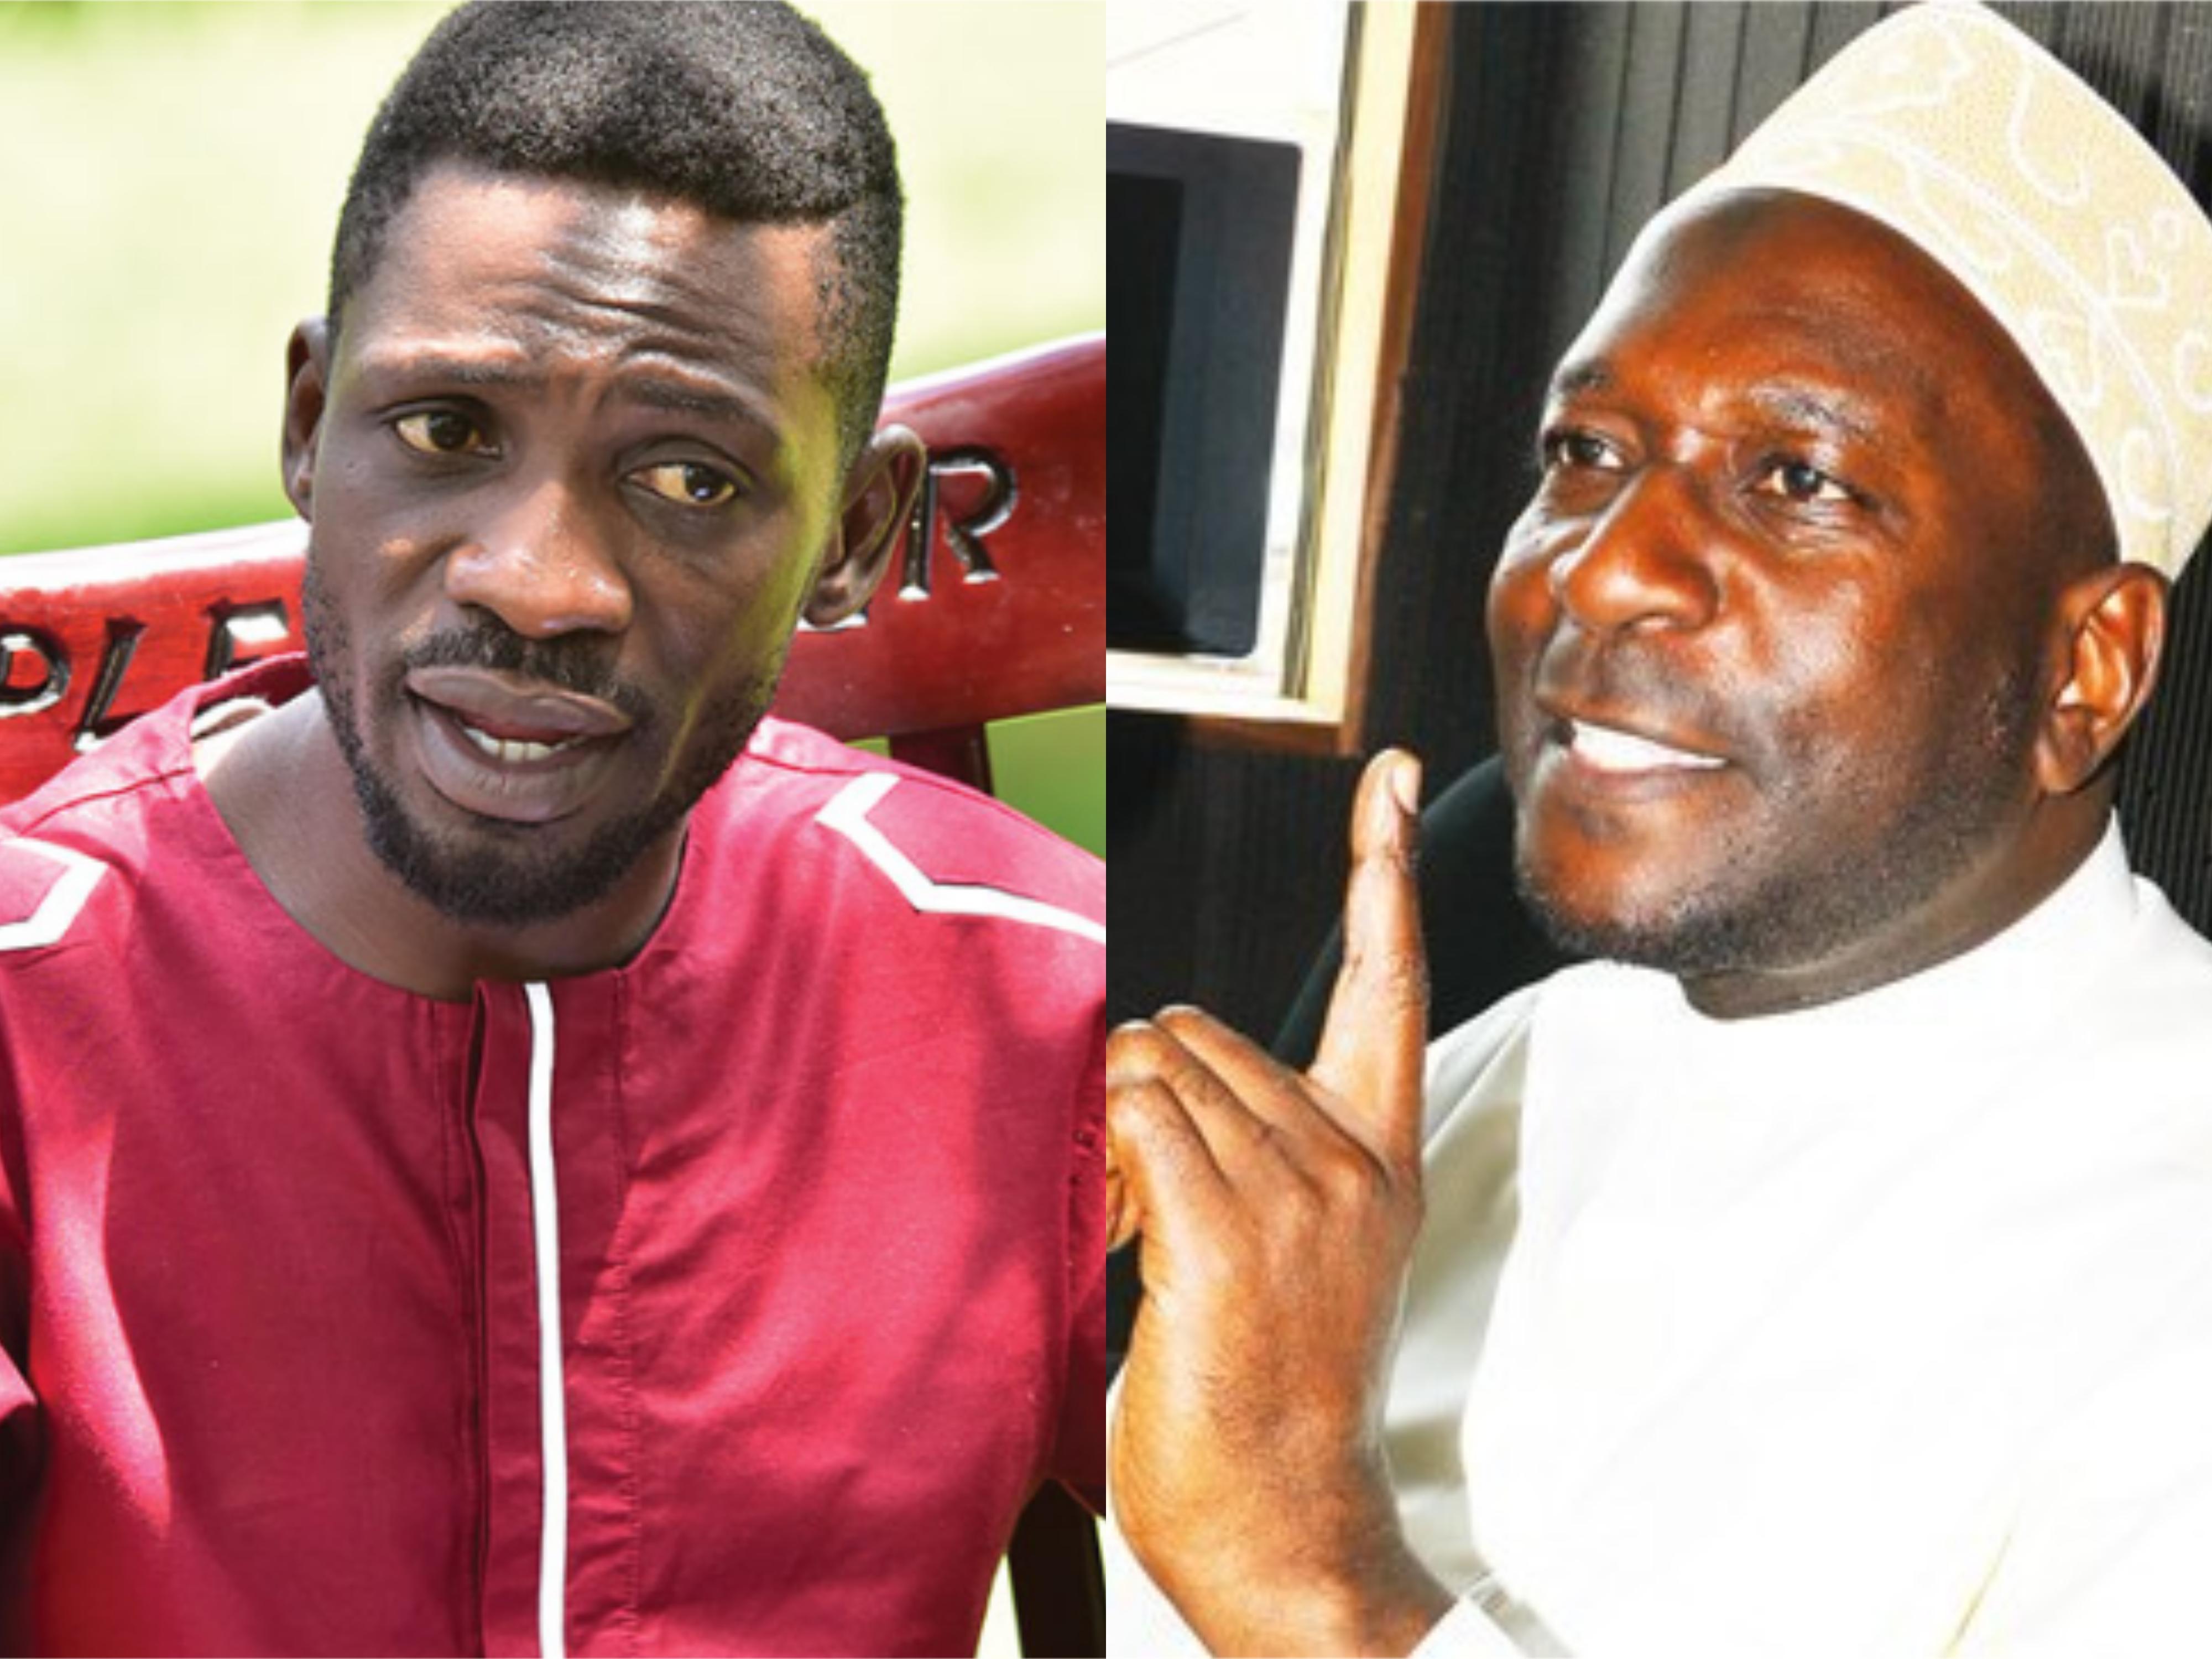 Sheikh Nuhu Muzaata (R) applauded Bobi Wine for his song 'Tuliyambala Engule'. (FILE PHOTO)